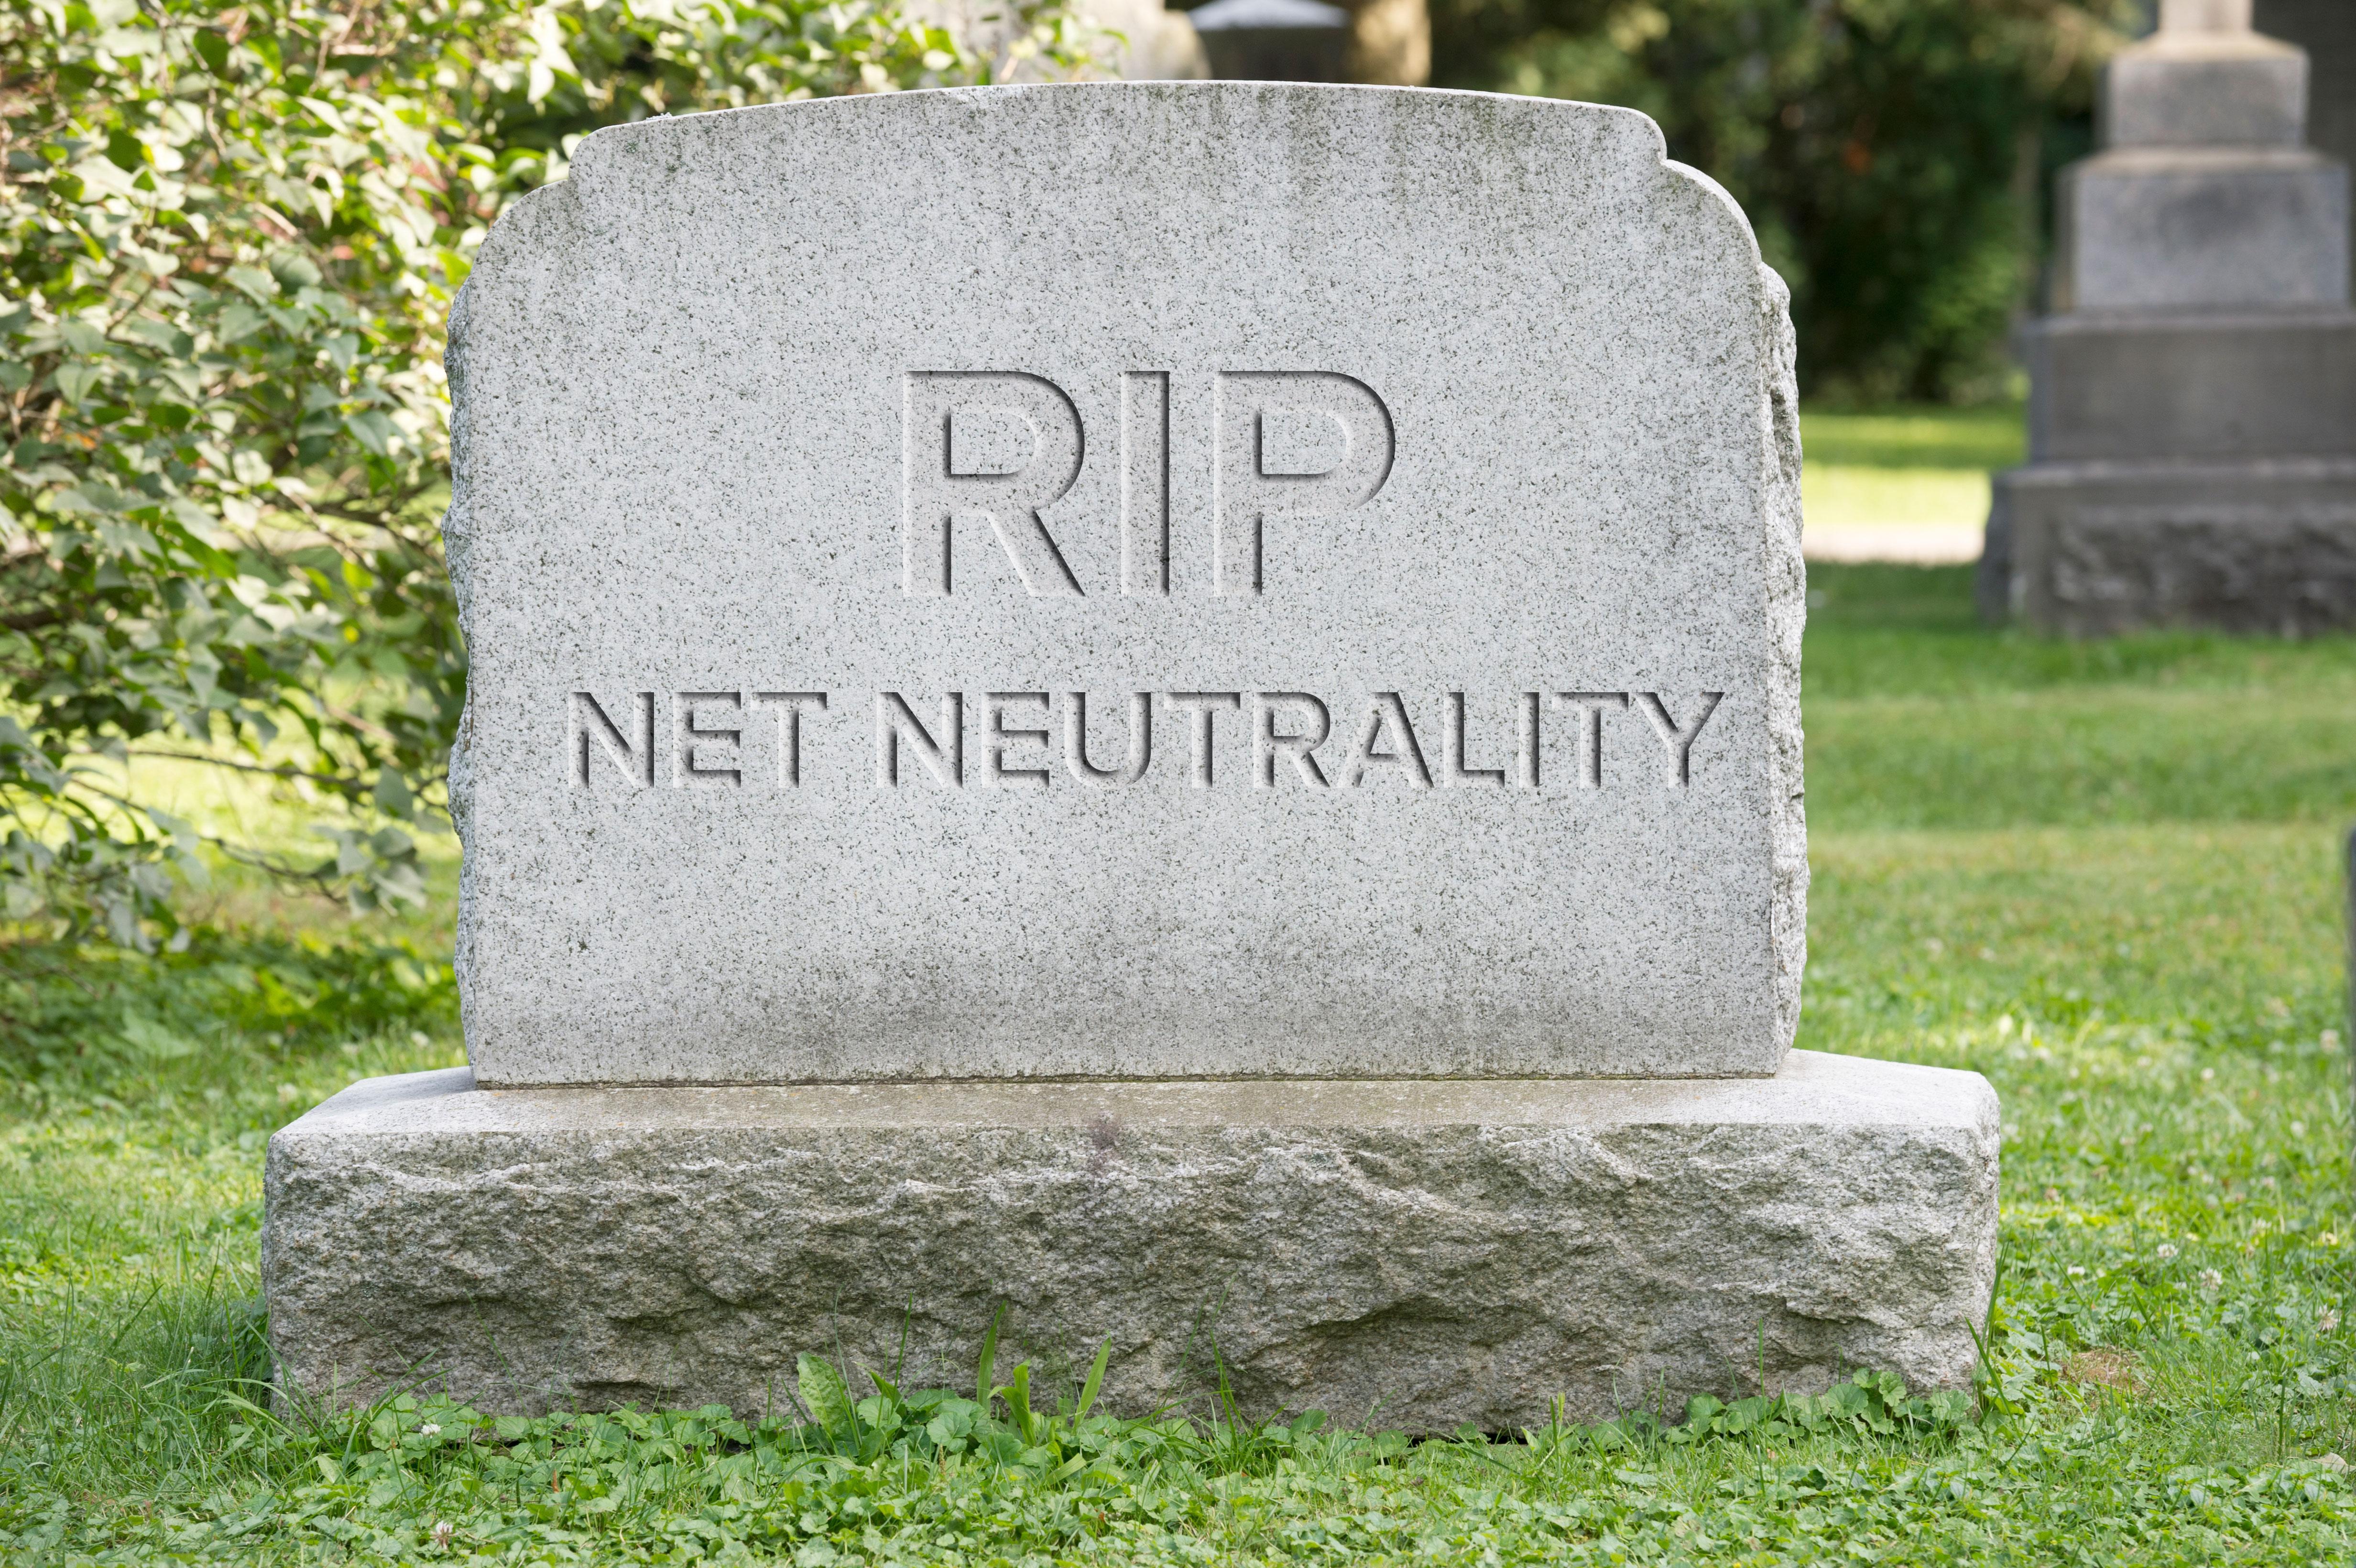 RIP net neutrality